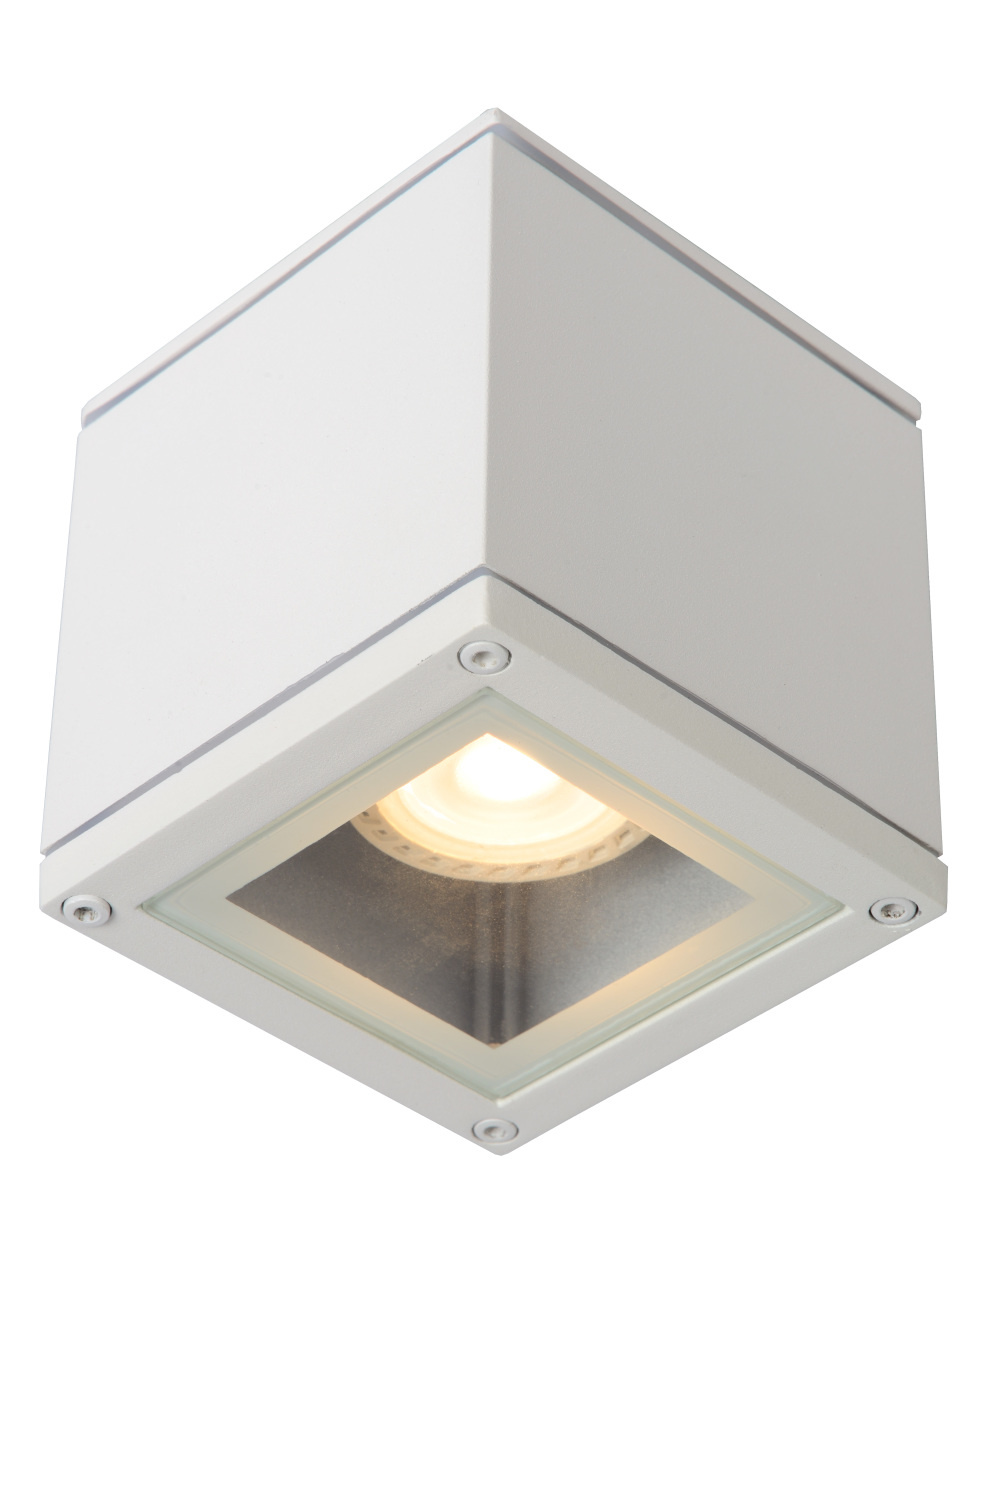 Lucide AVEN Plafondspot Badk.-Wit-1xGU10-50W-IP65-Alumin.